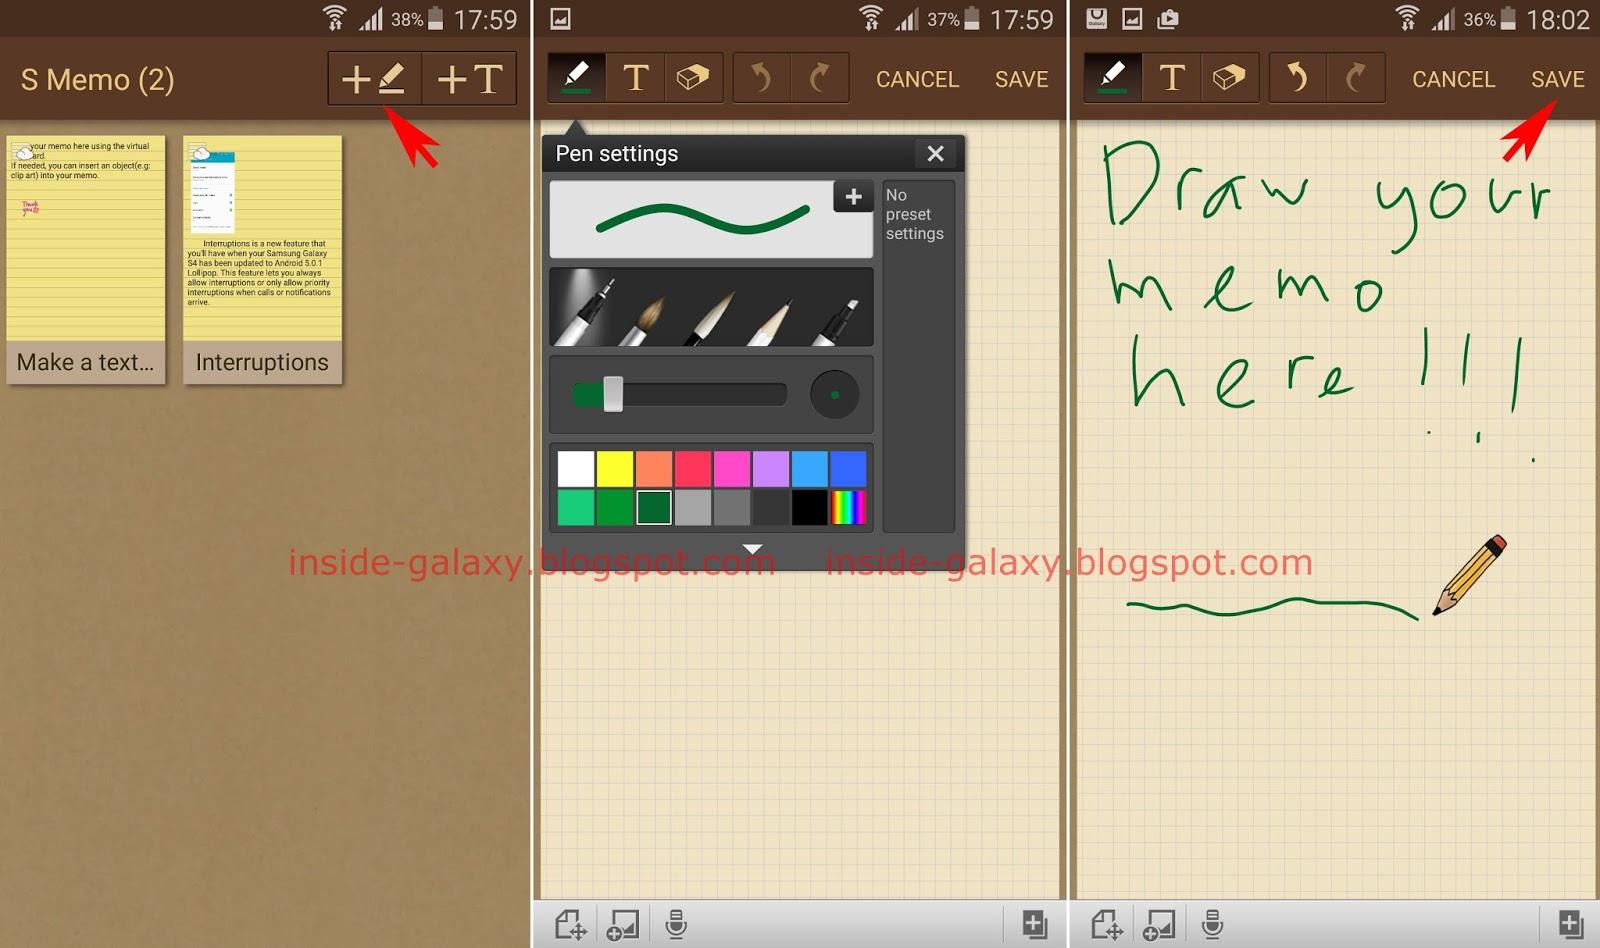 Samsung Galaxy S4: How to Create a Handwritten Memo Using S Memo.